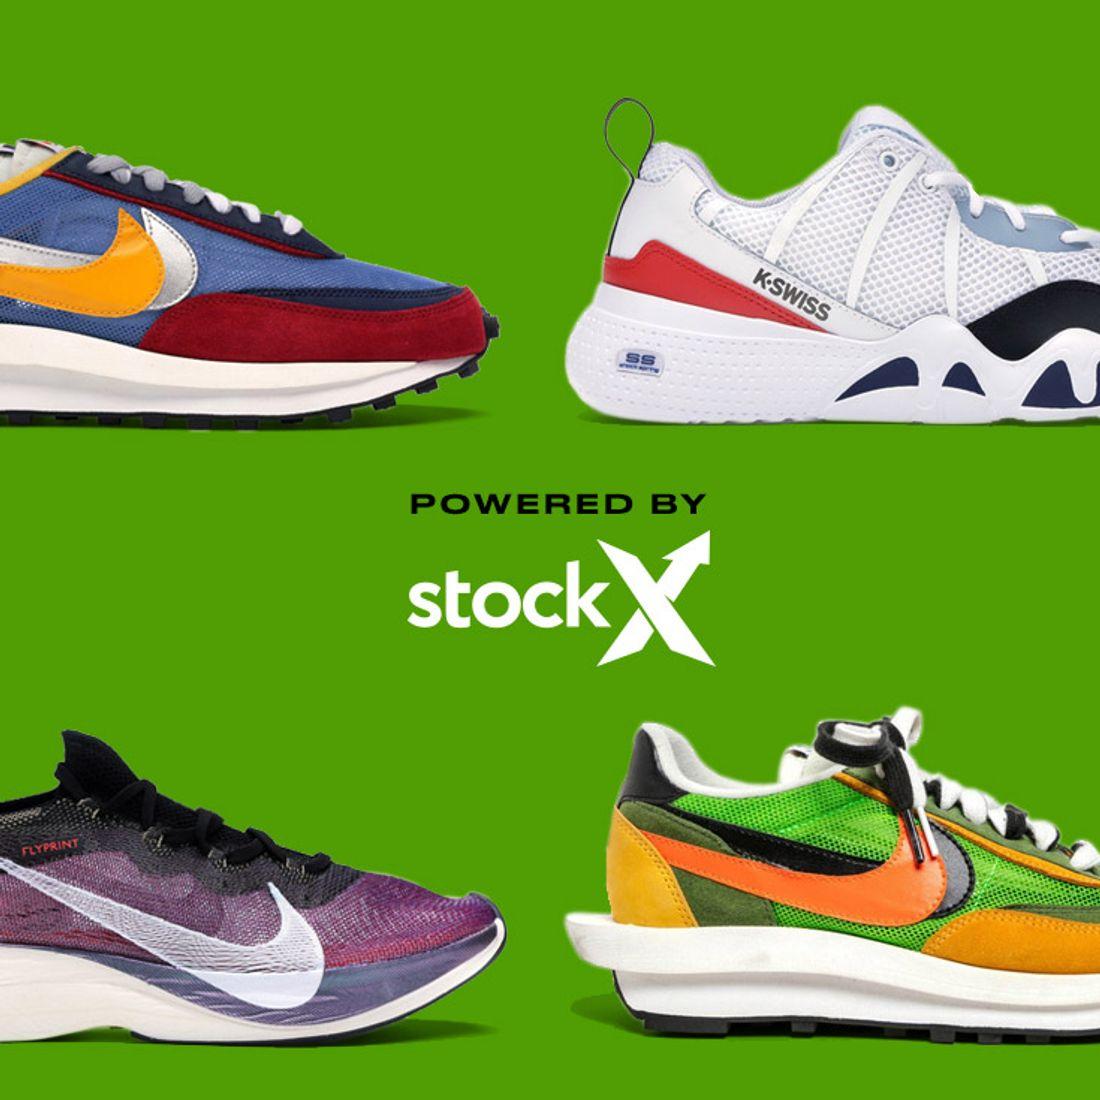 rumor Prima Doctor en Filosofía  Resale Round-Up: March's Most Valuable Sneakers - Sneaker Freaker